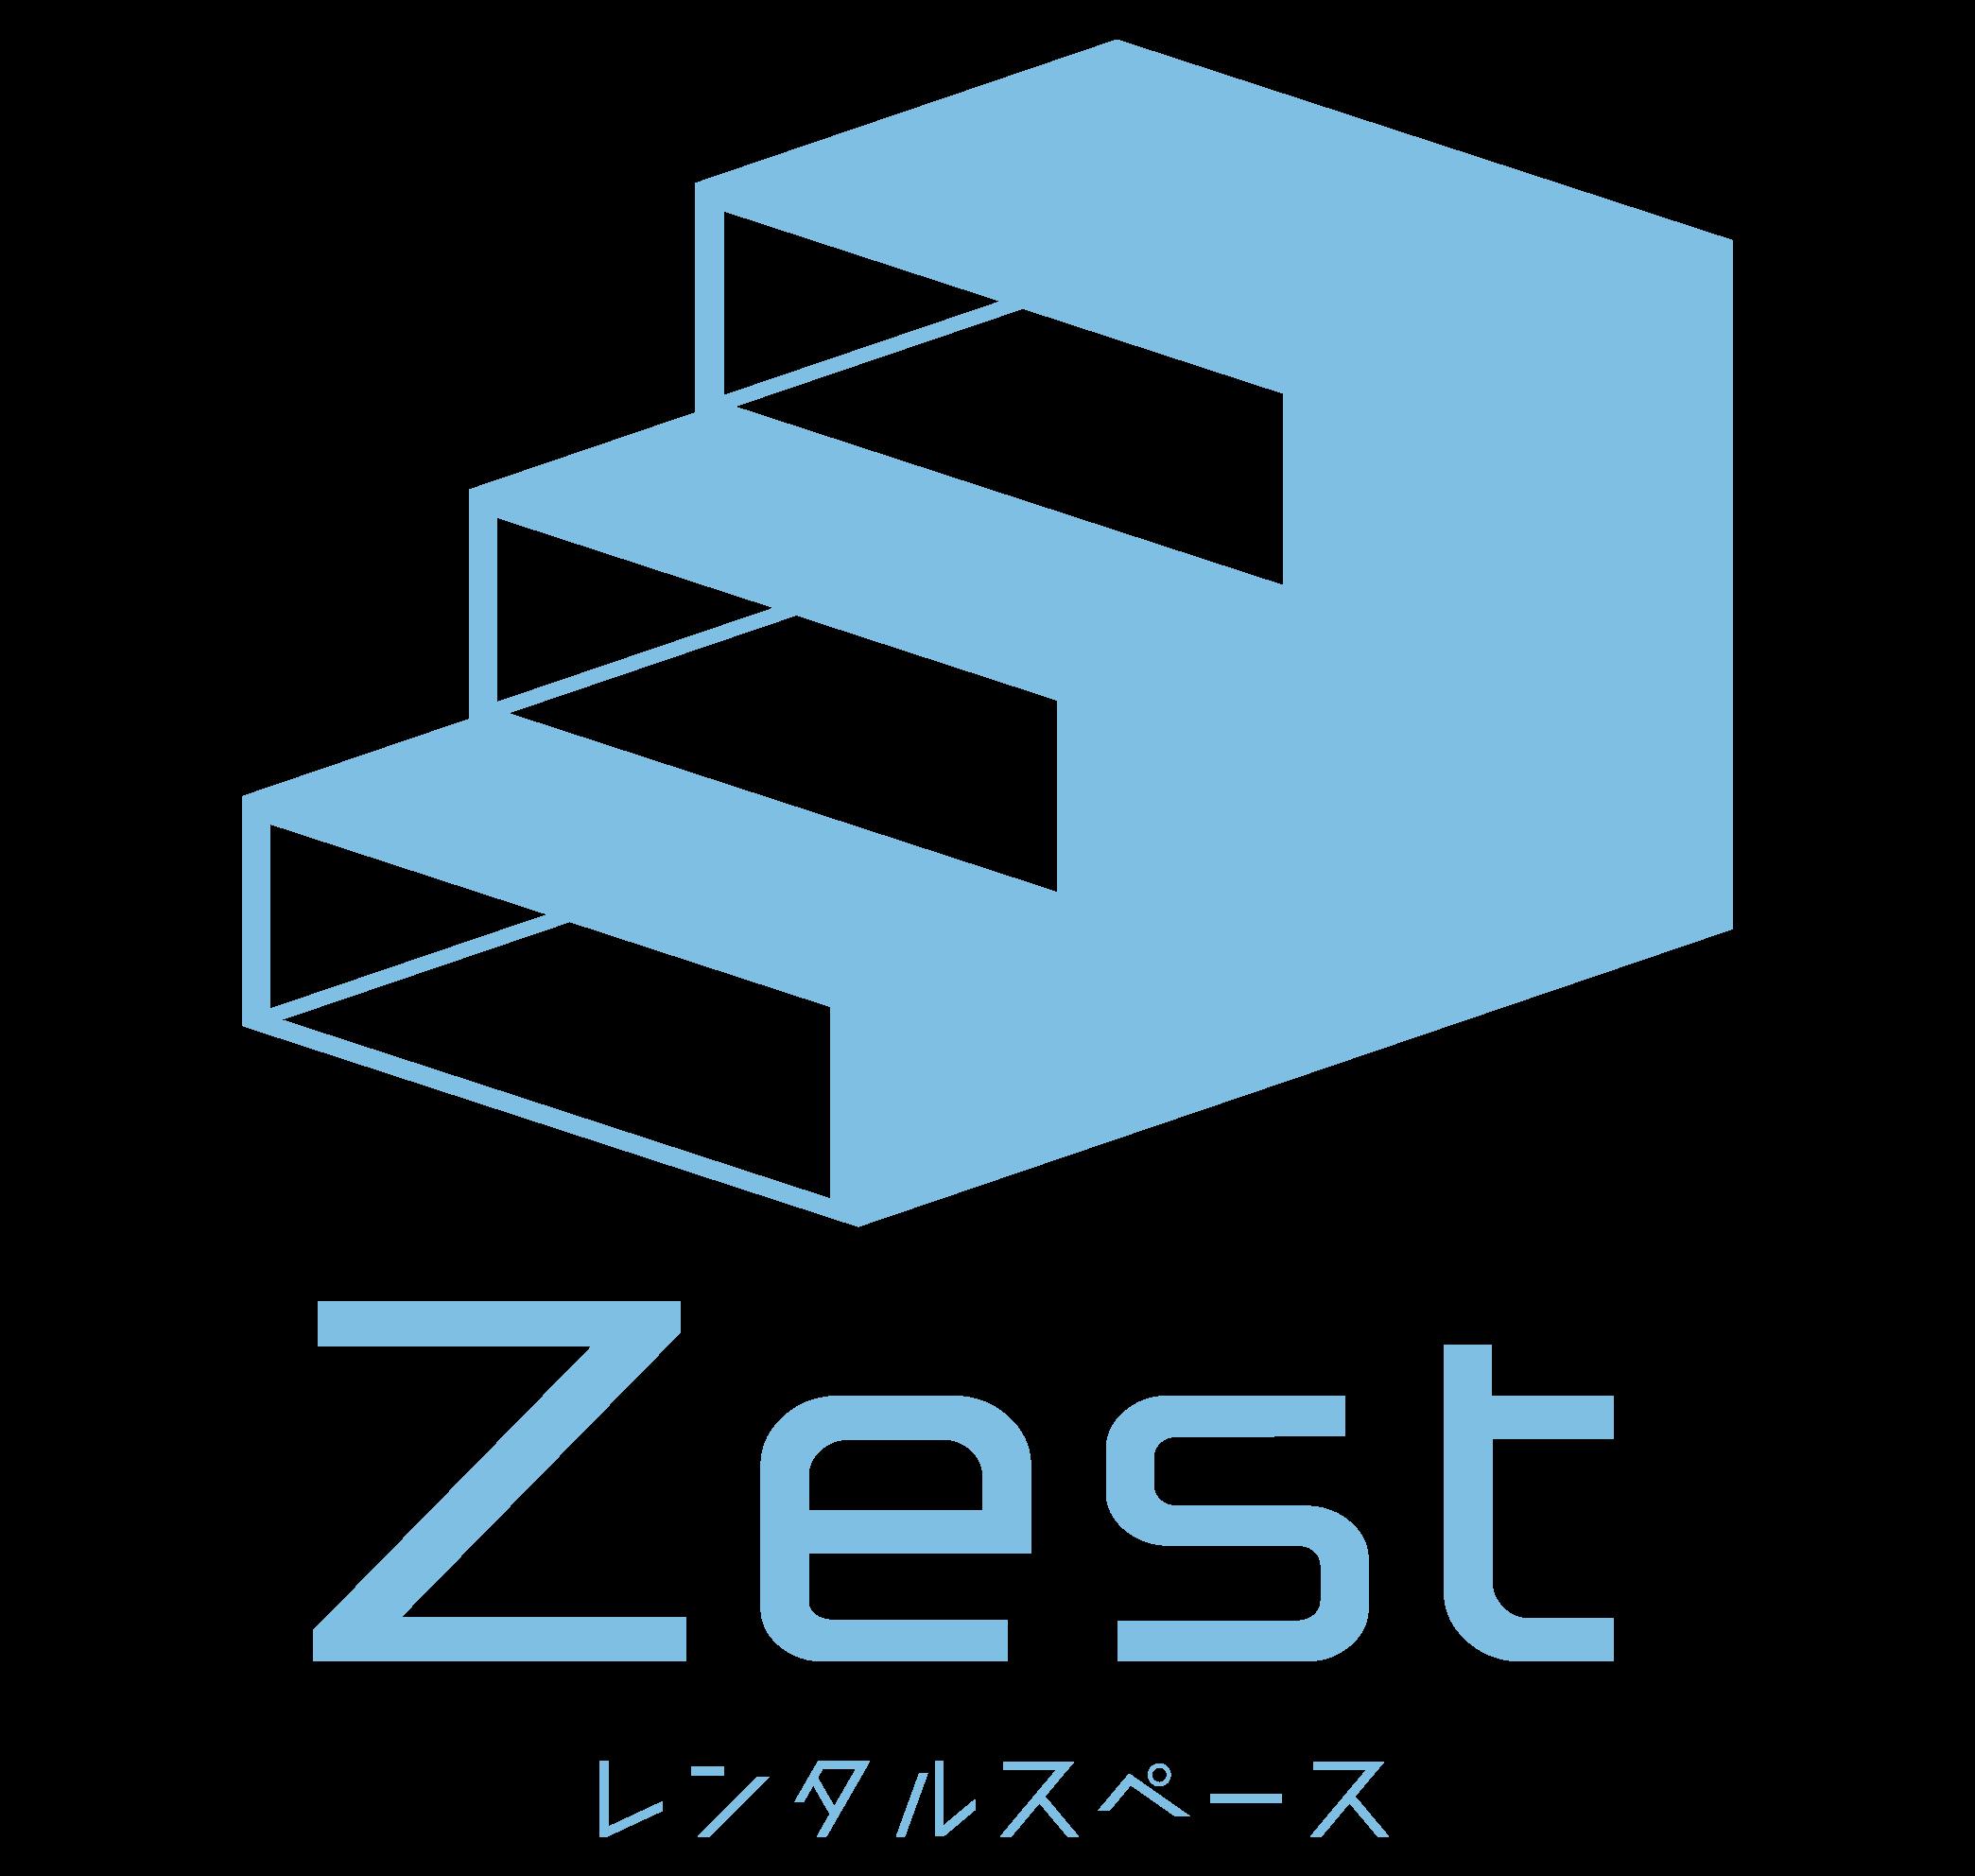 zest(ゼスト)|岡山表町商店街レンタルスペース・コワーキングスペース